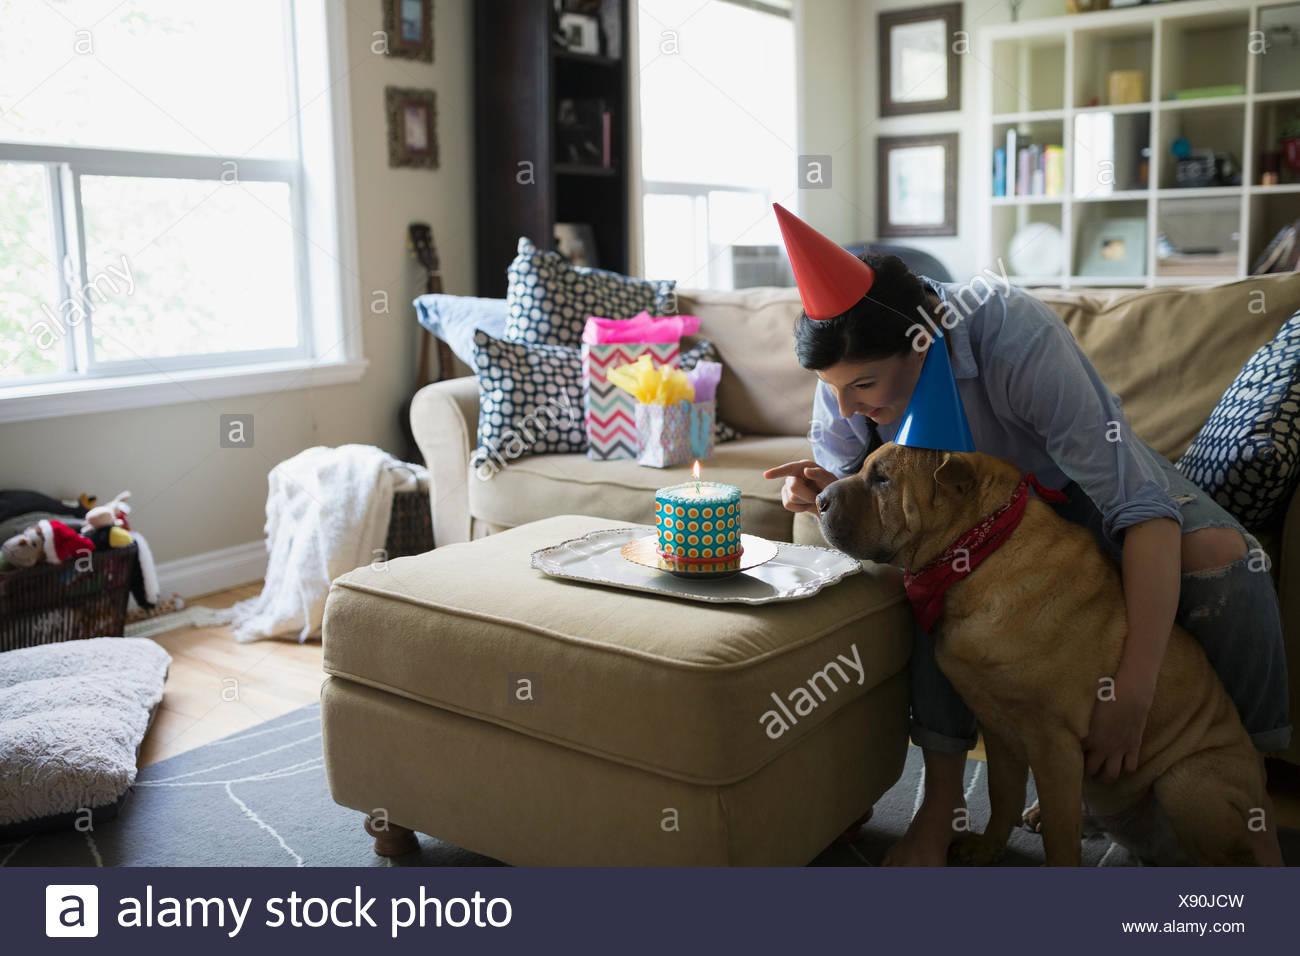 Woman and dog celebrating birthday with cake - Stock Image